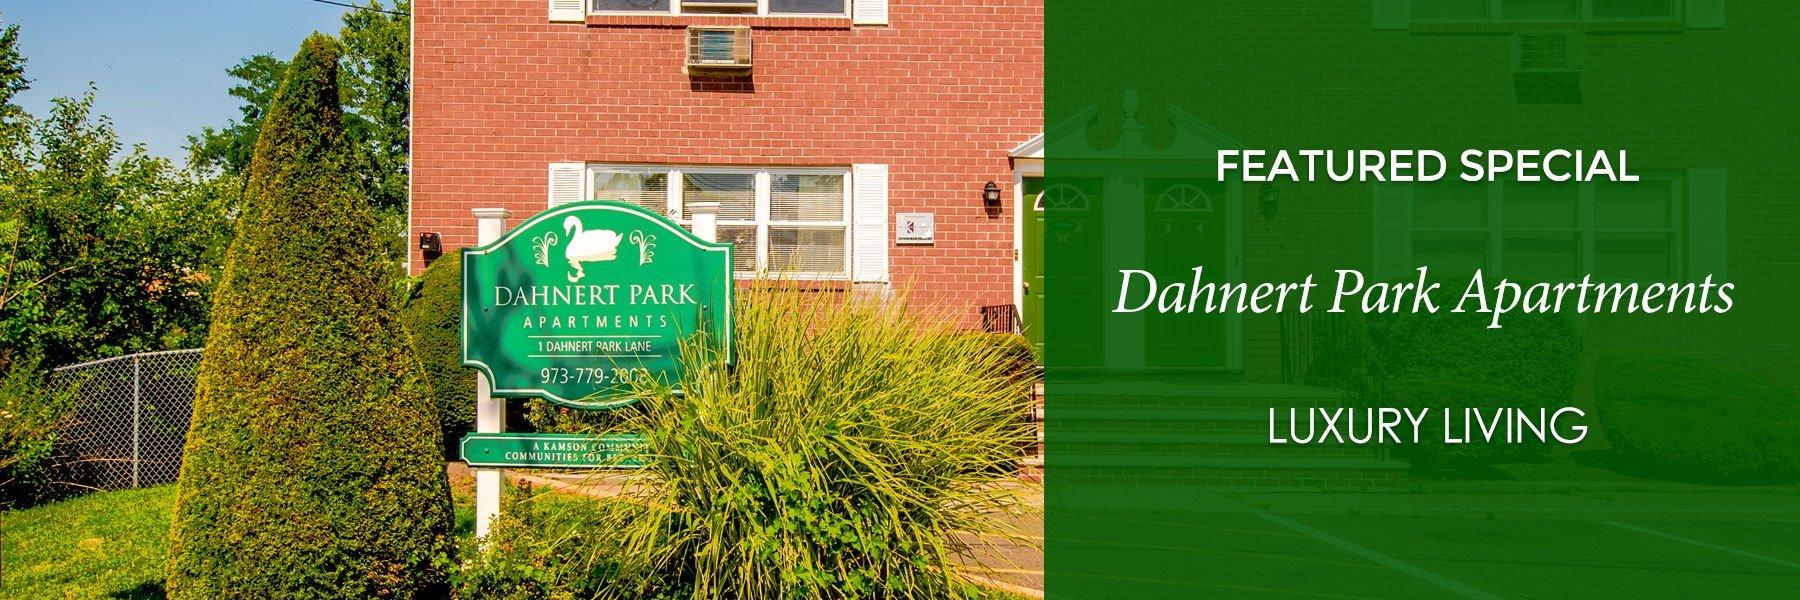 Dahnert Park Apartments For Rent in Garfield, NJ Specials